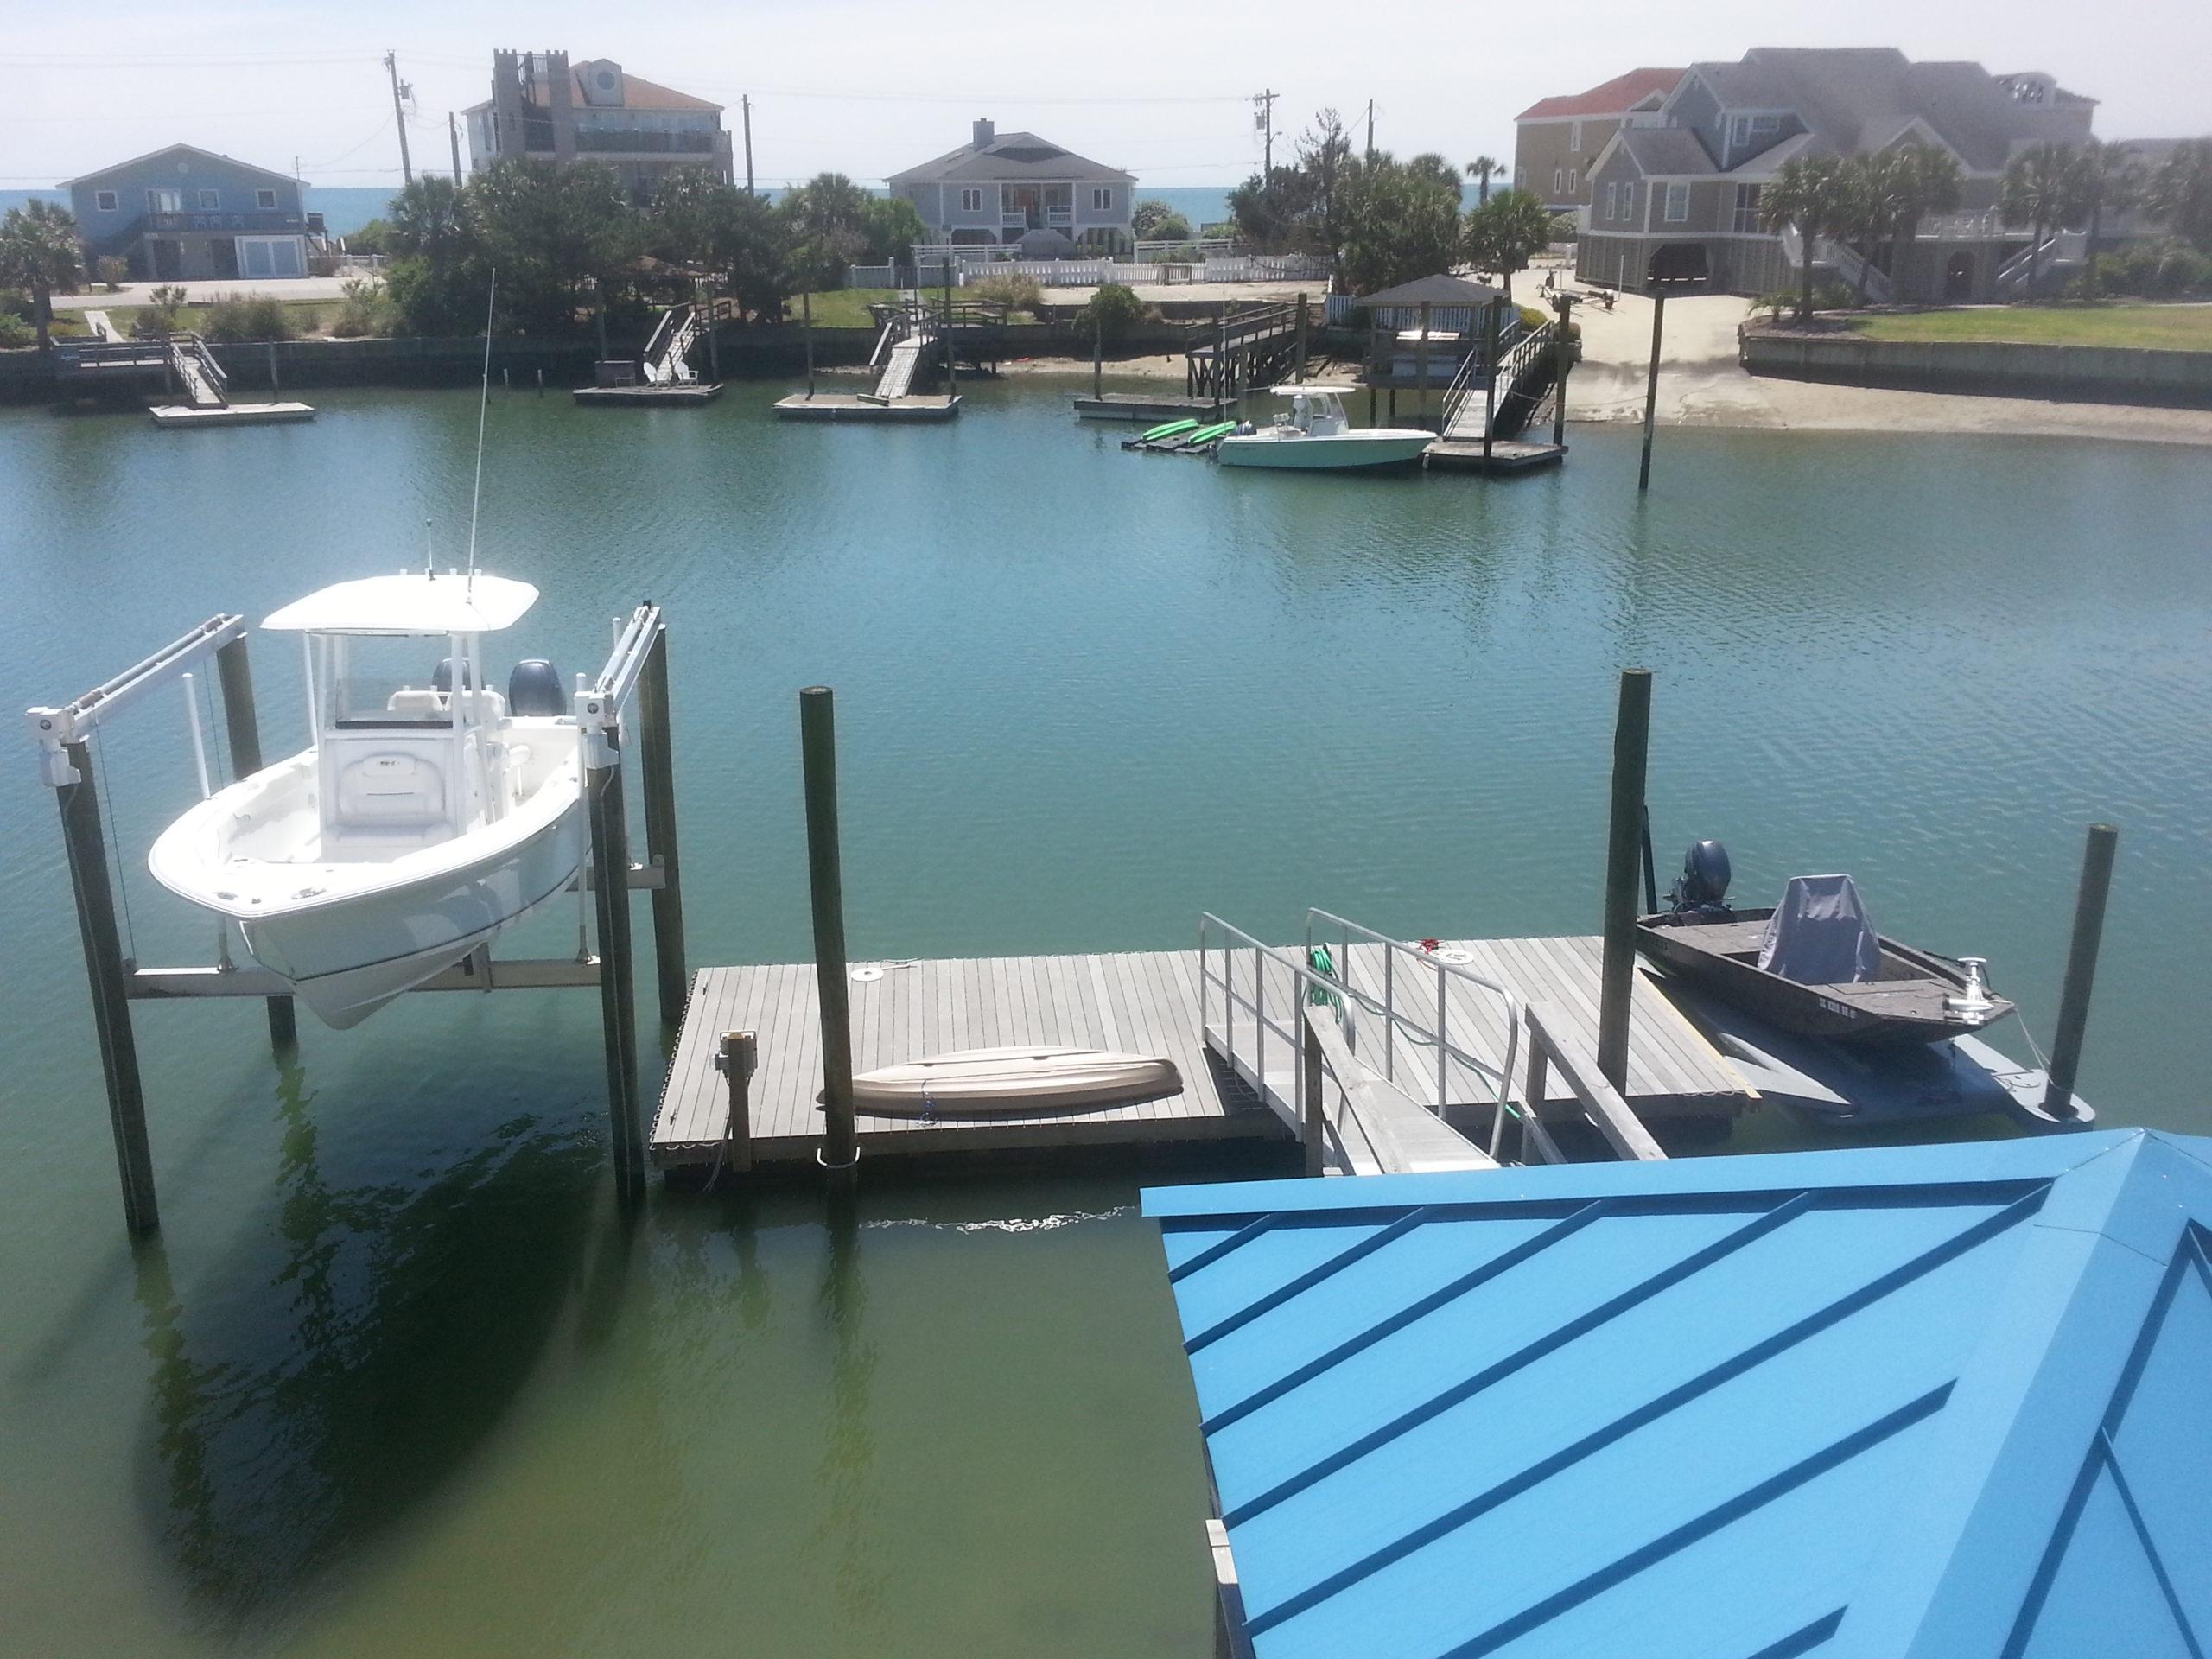 Plummer Boatlift and Retreat floating boat storage